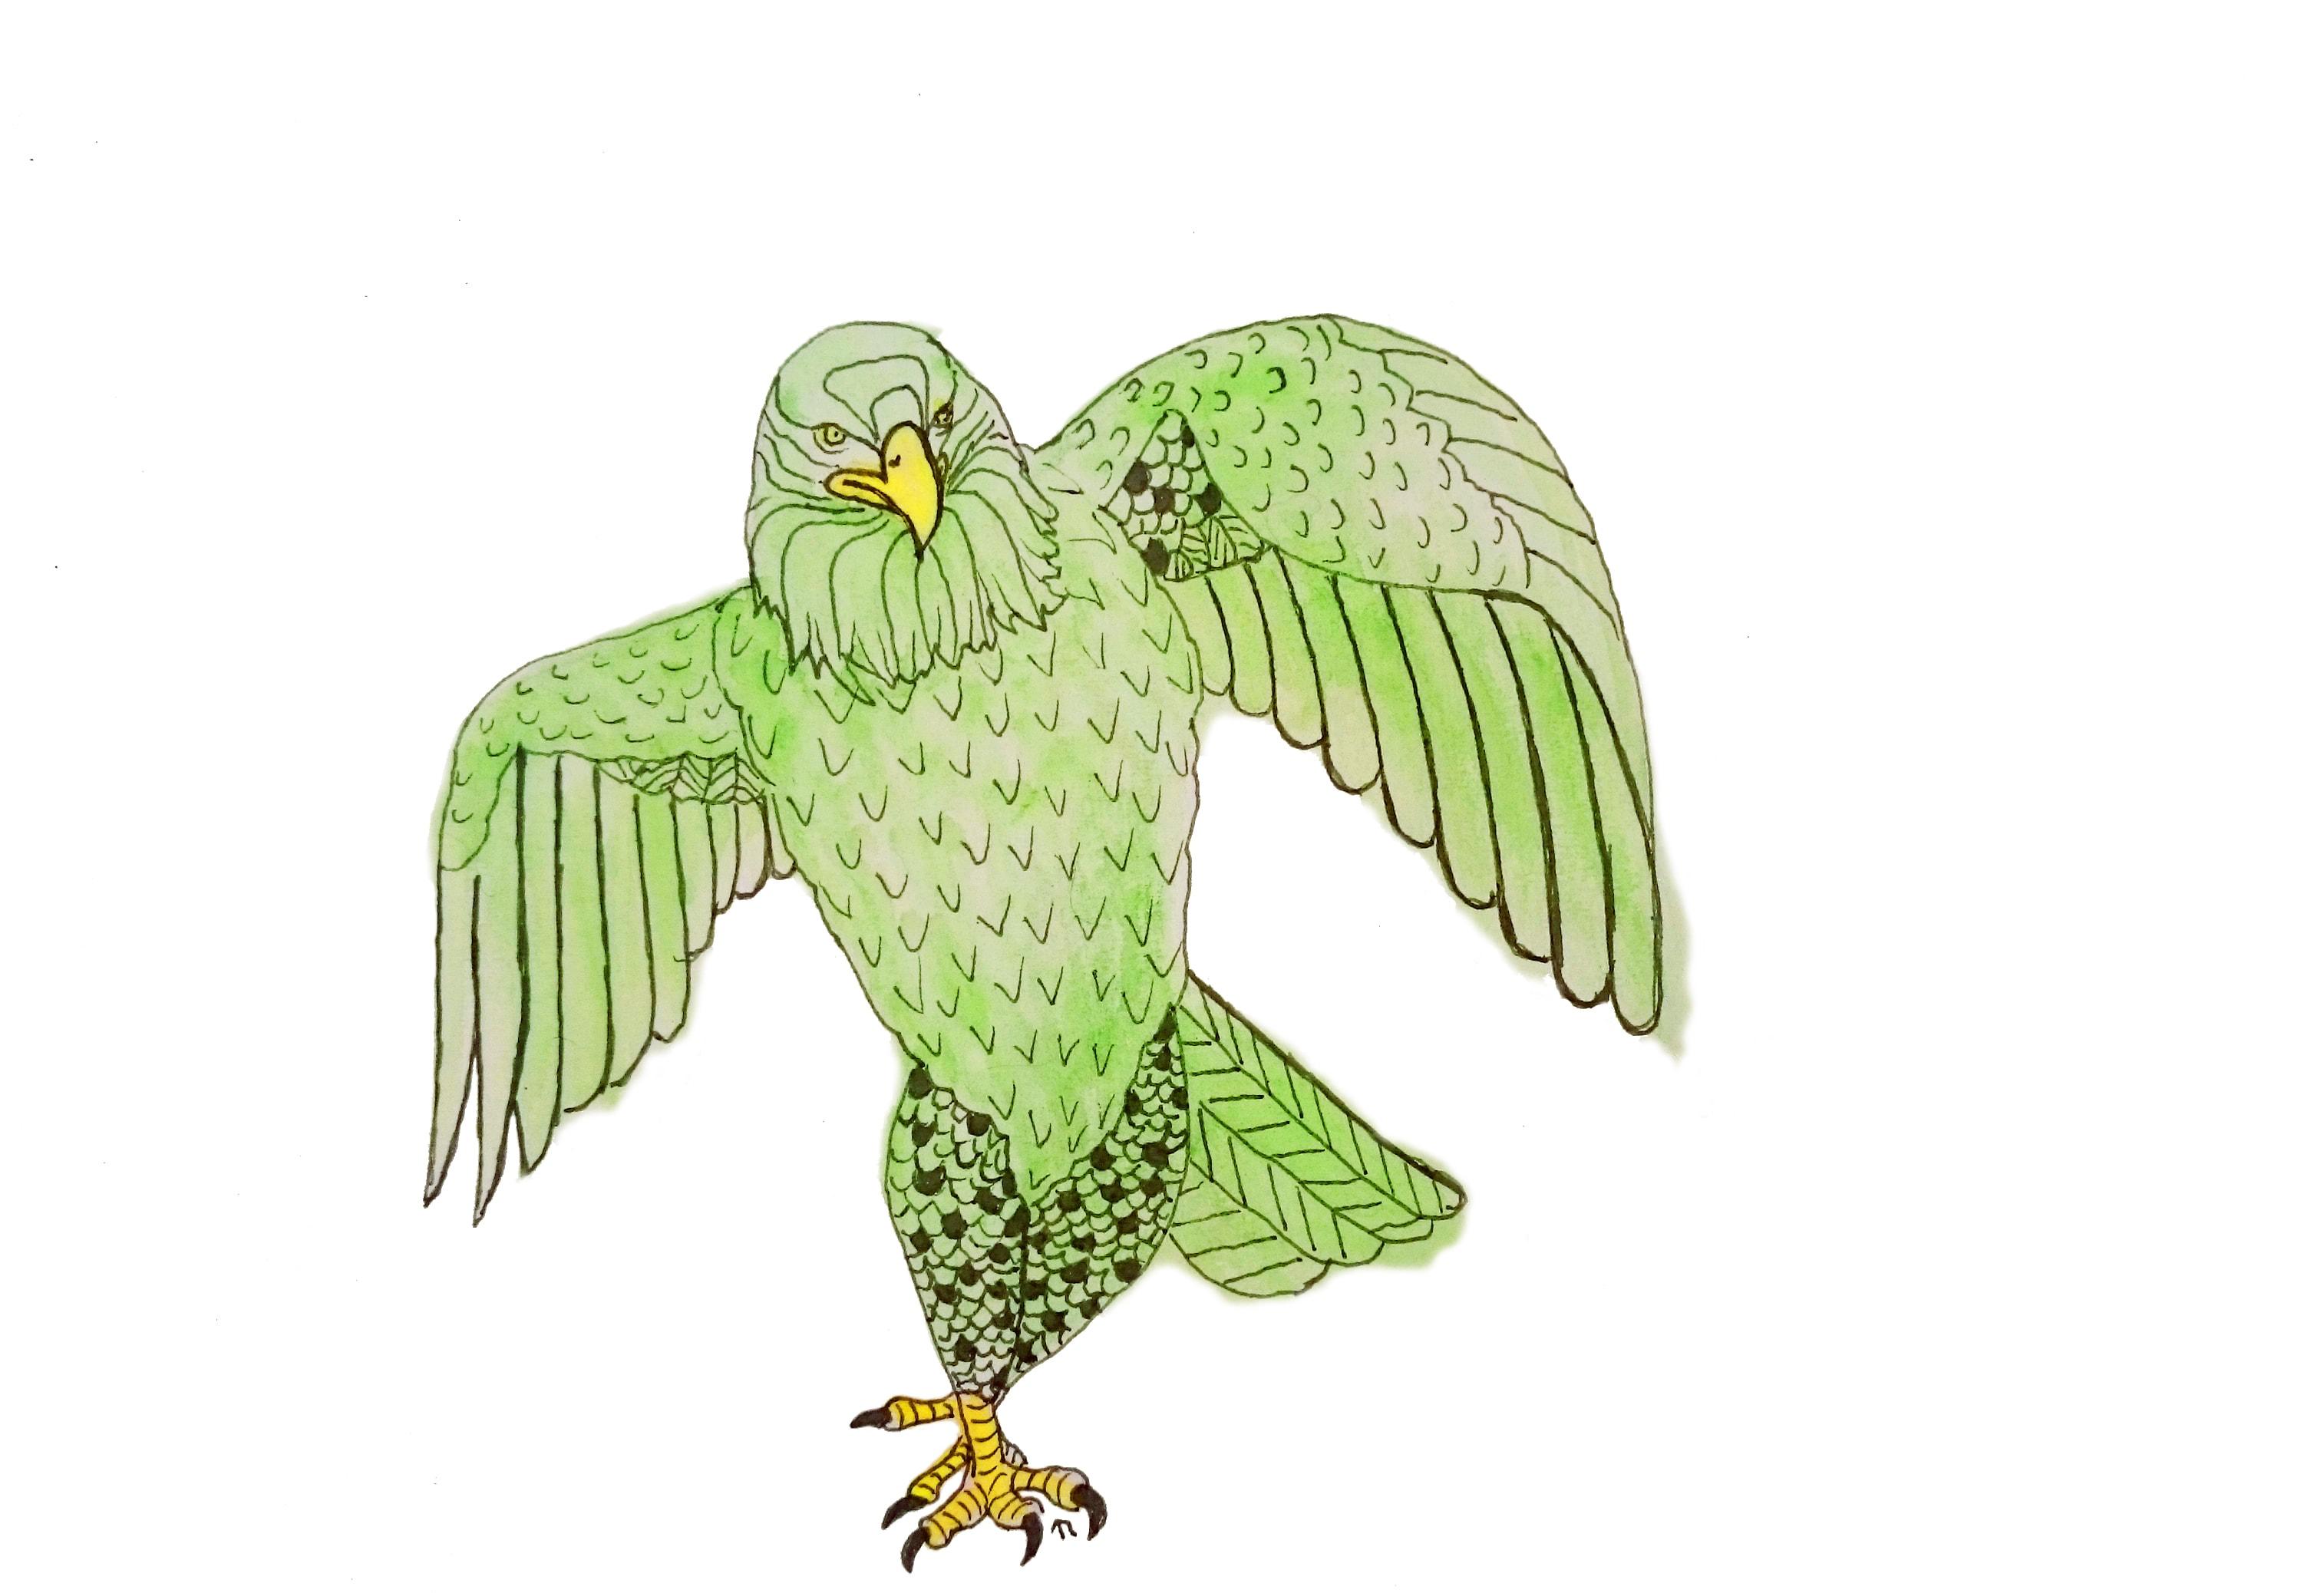 Strange Birds - 4 - Struttende Ørn i Grønt